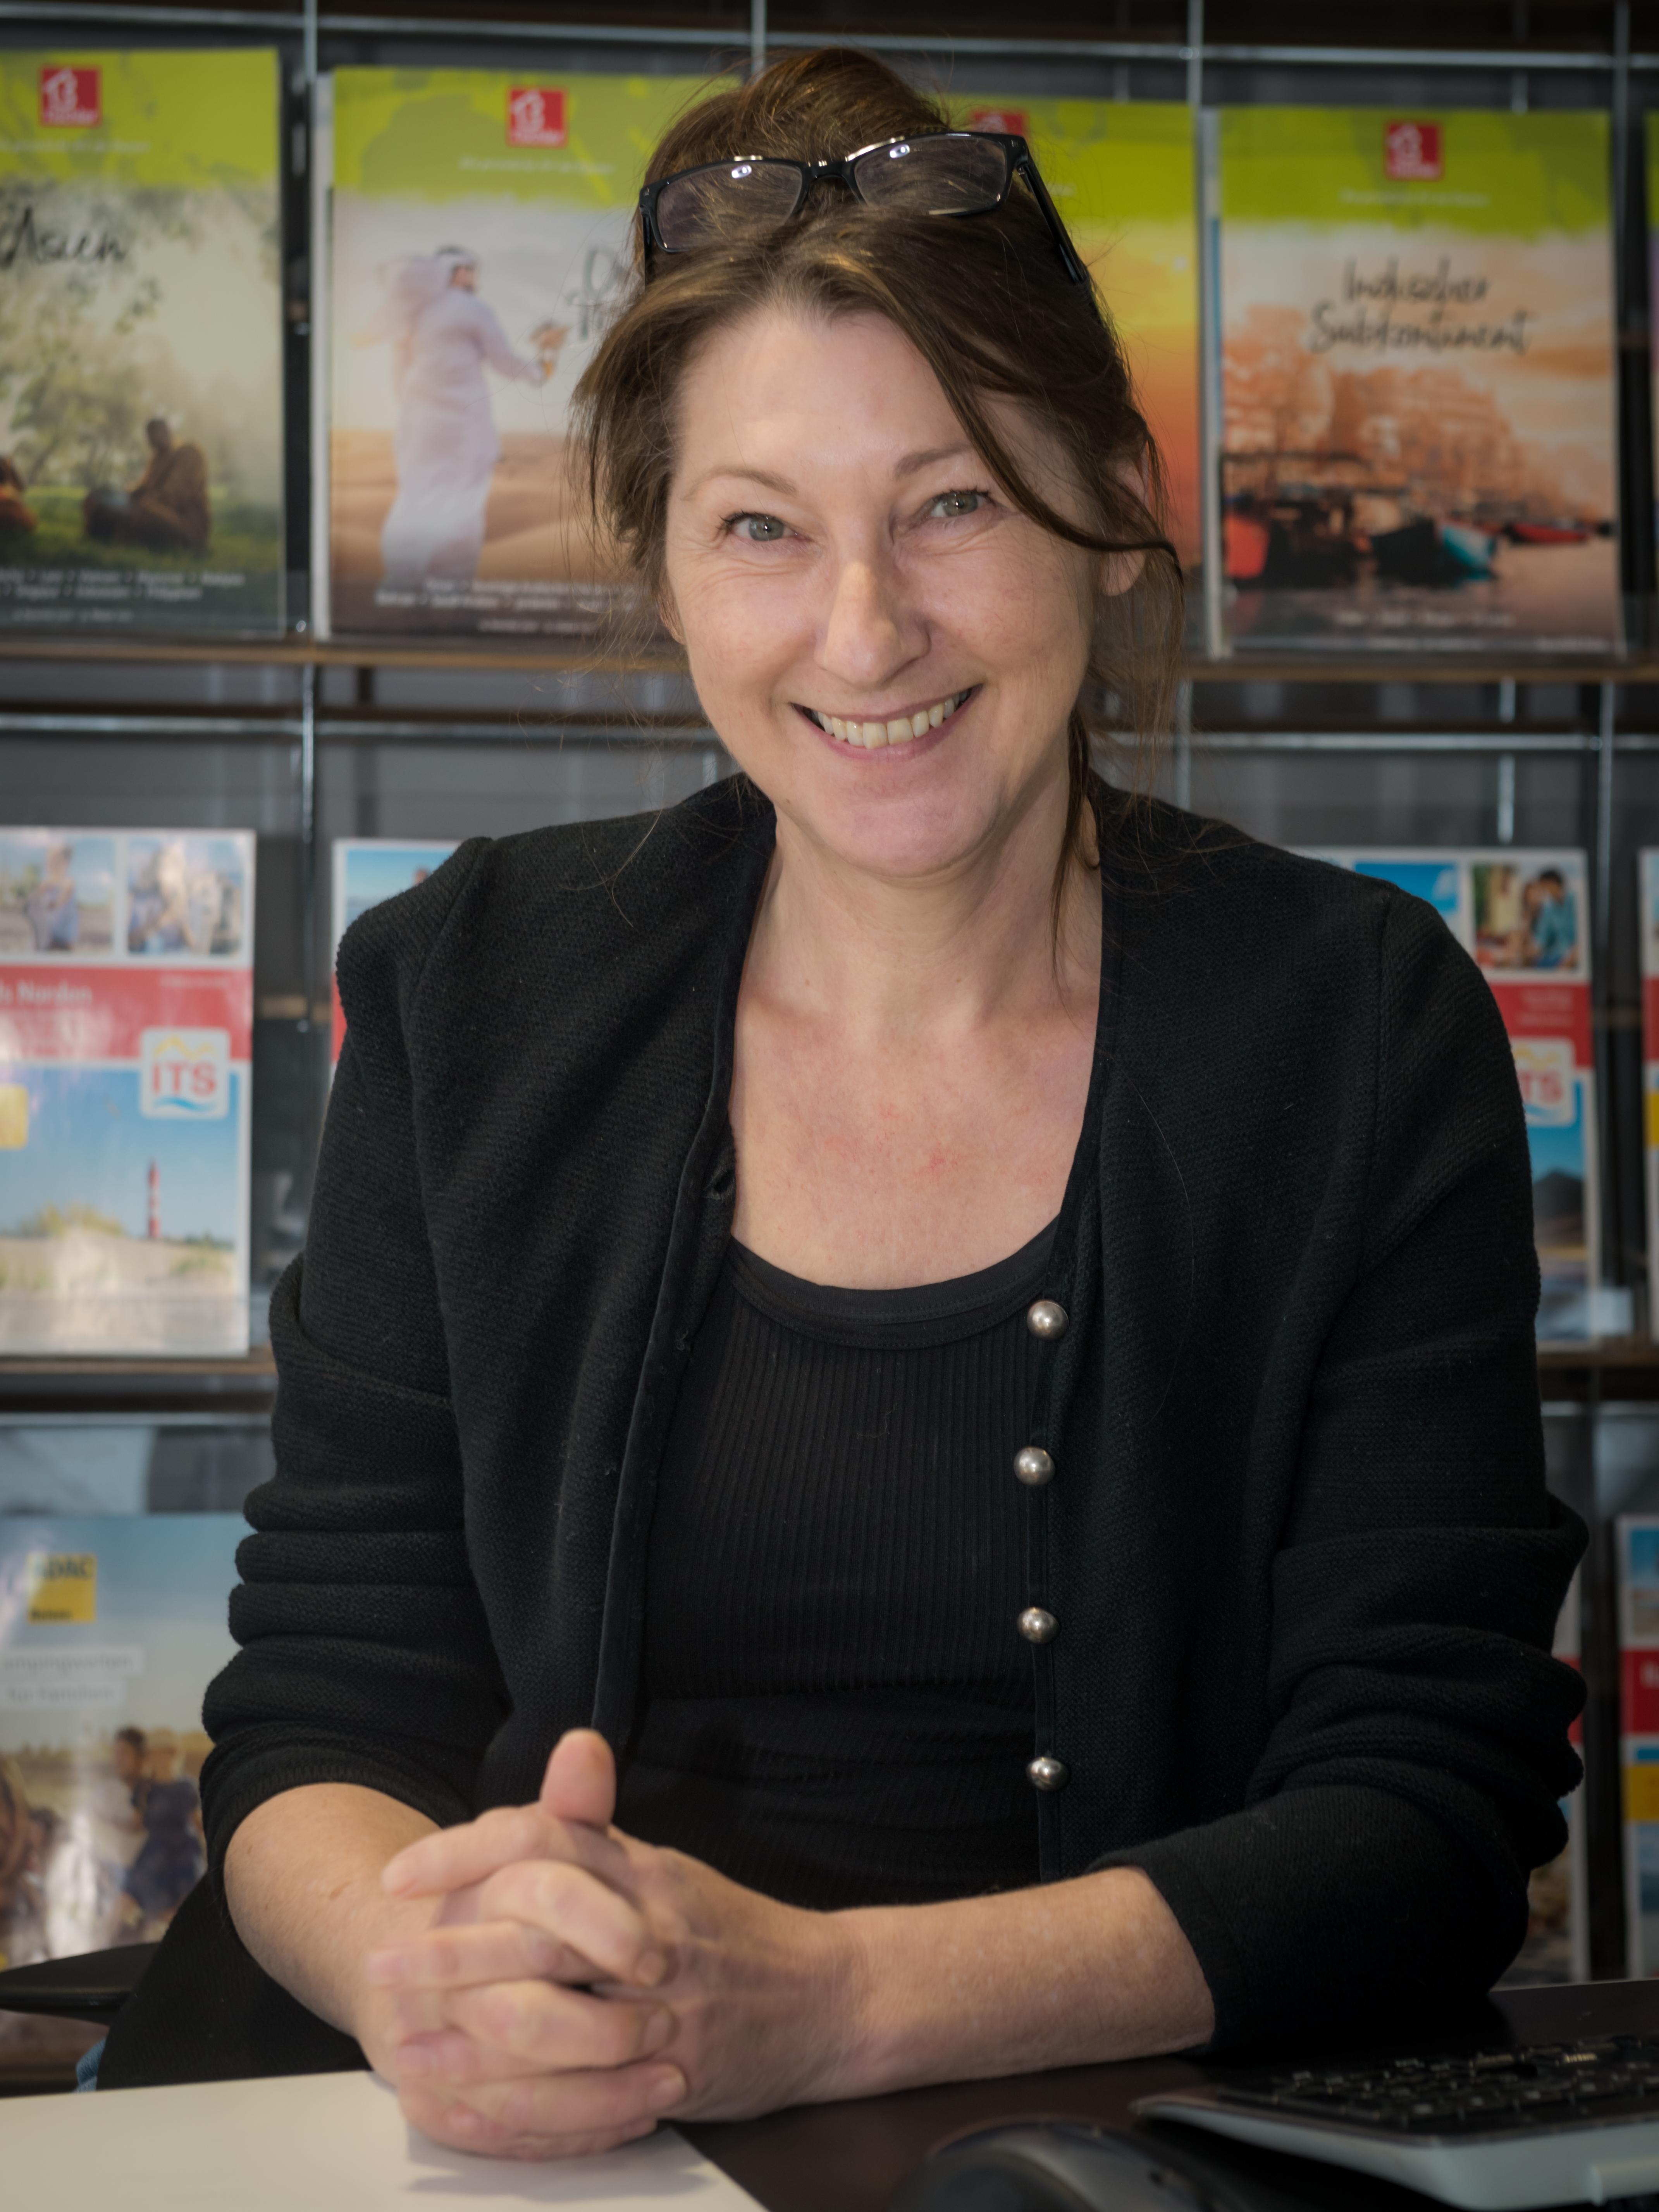 Marianne Maierhofer